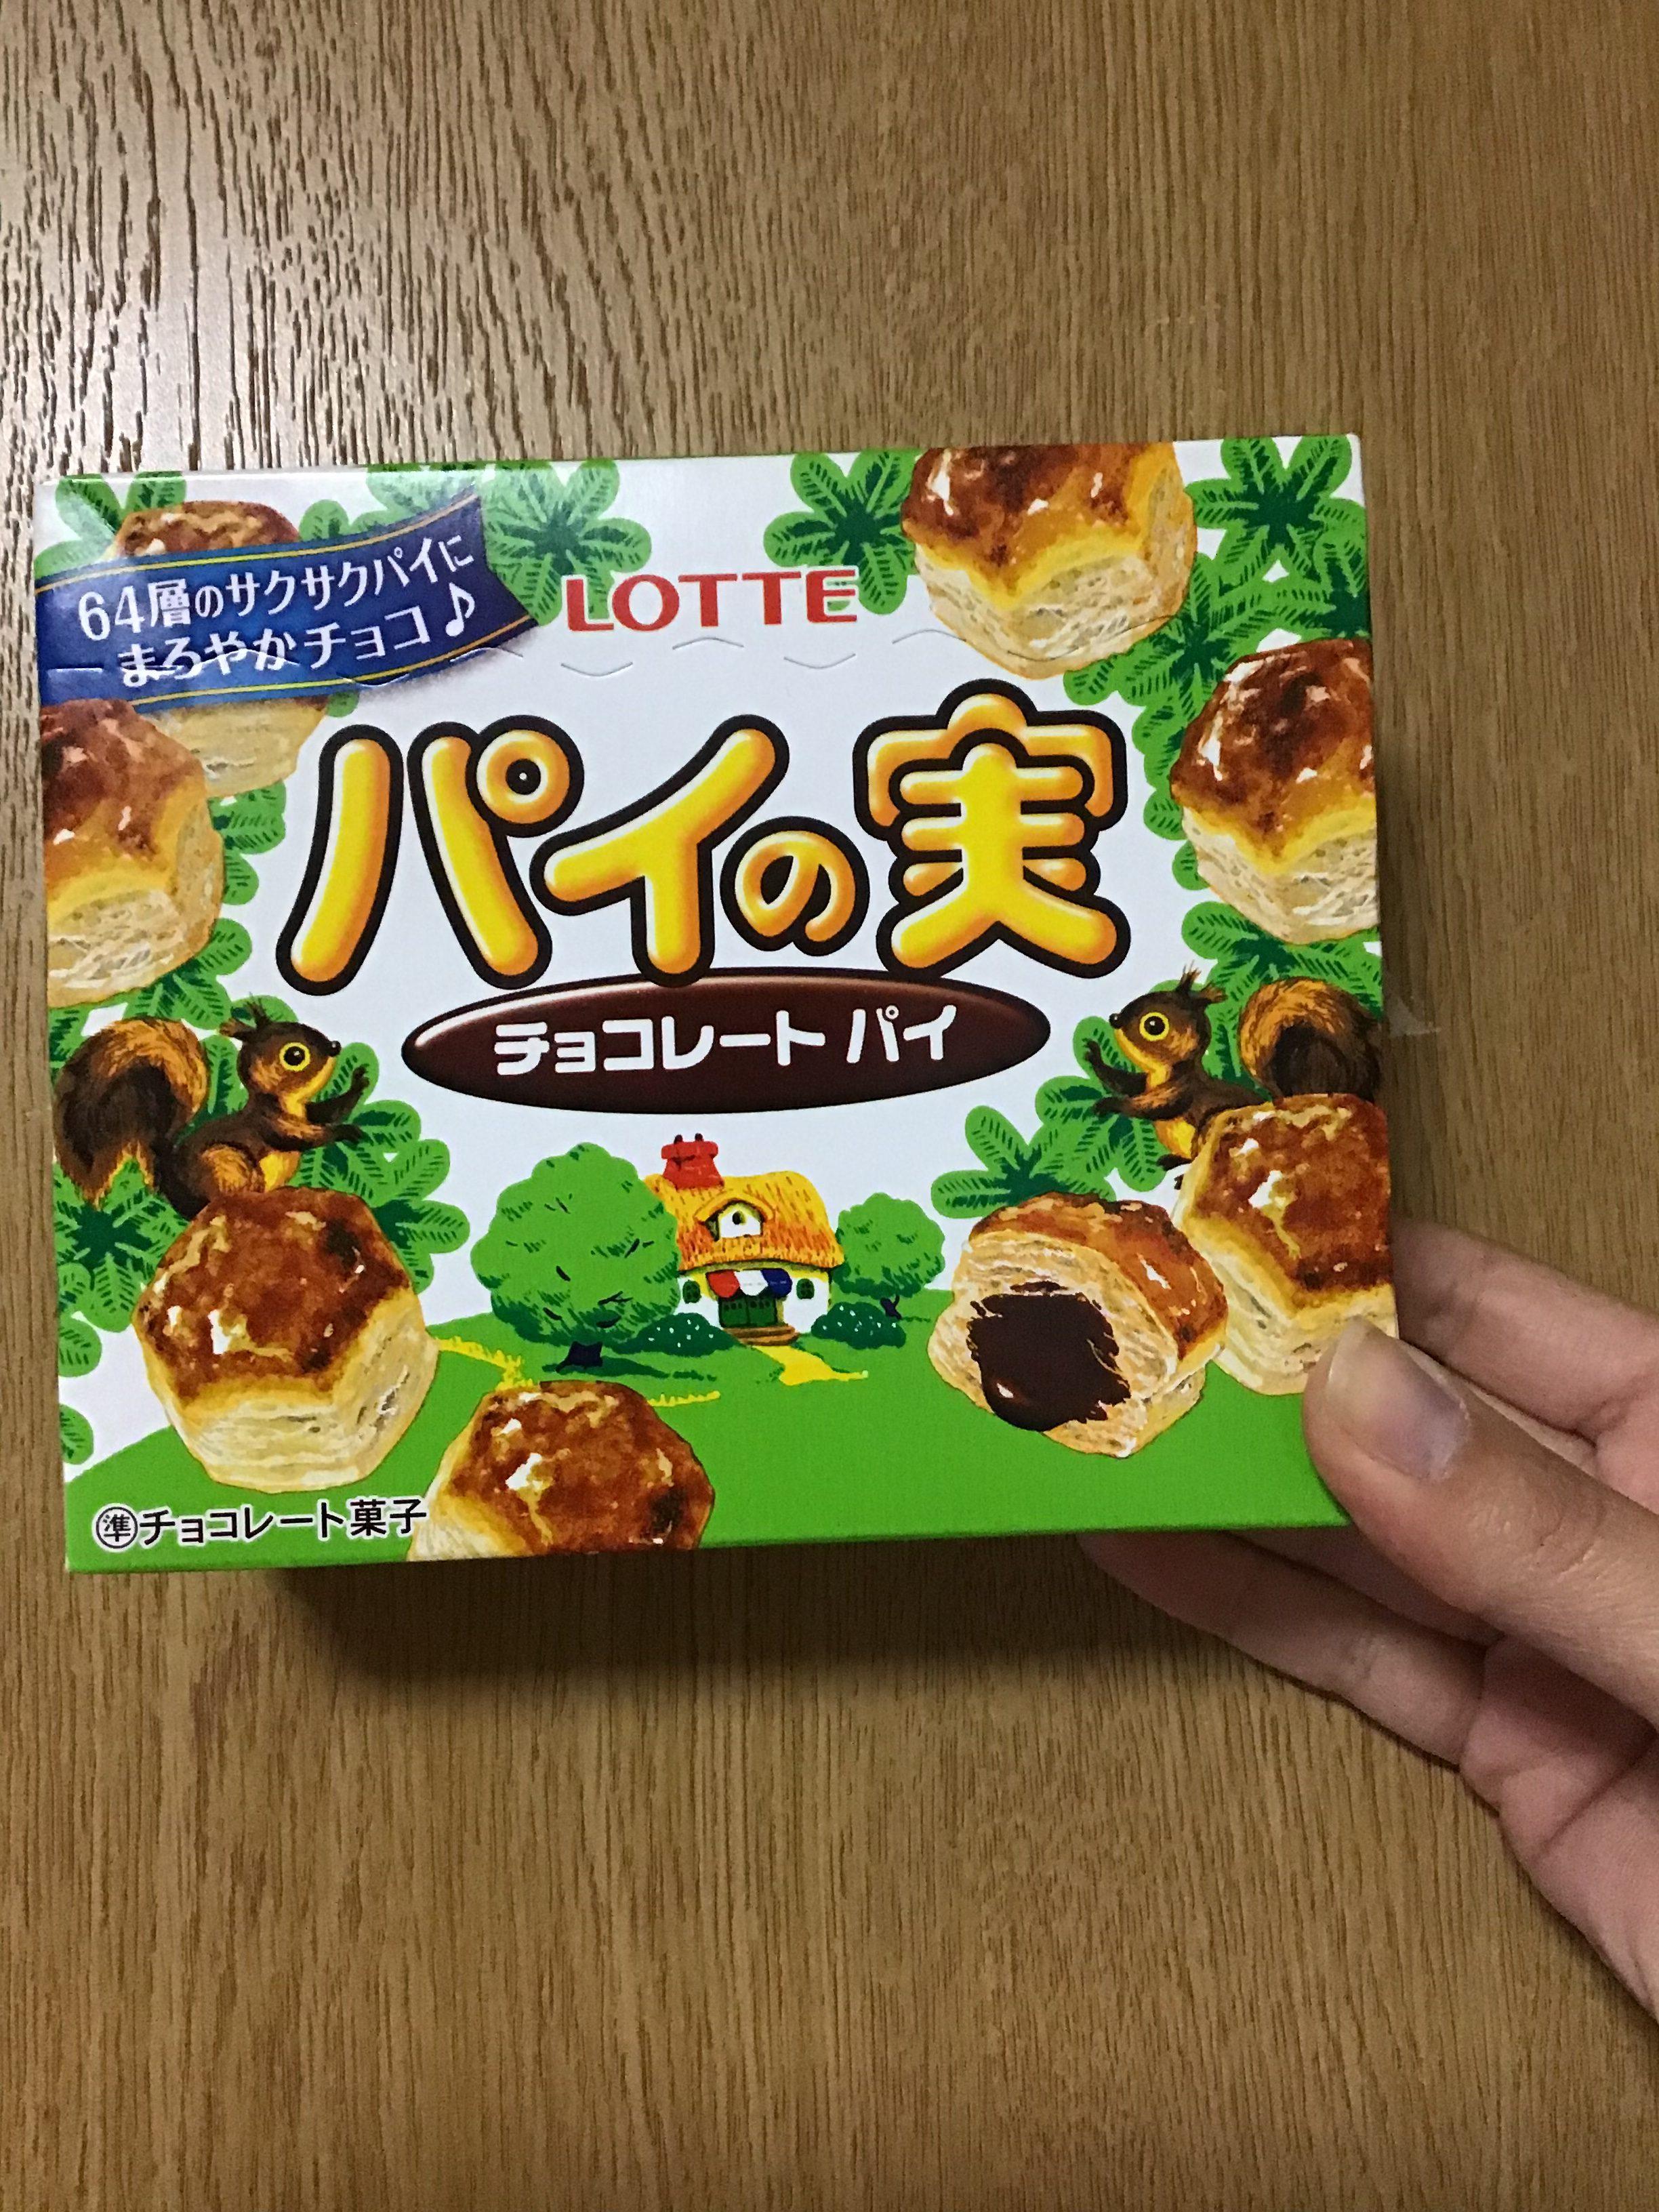 Lotte's original パイの実(Pie no Mi)